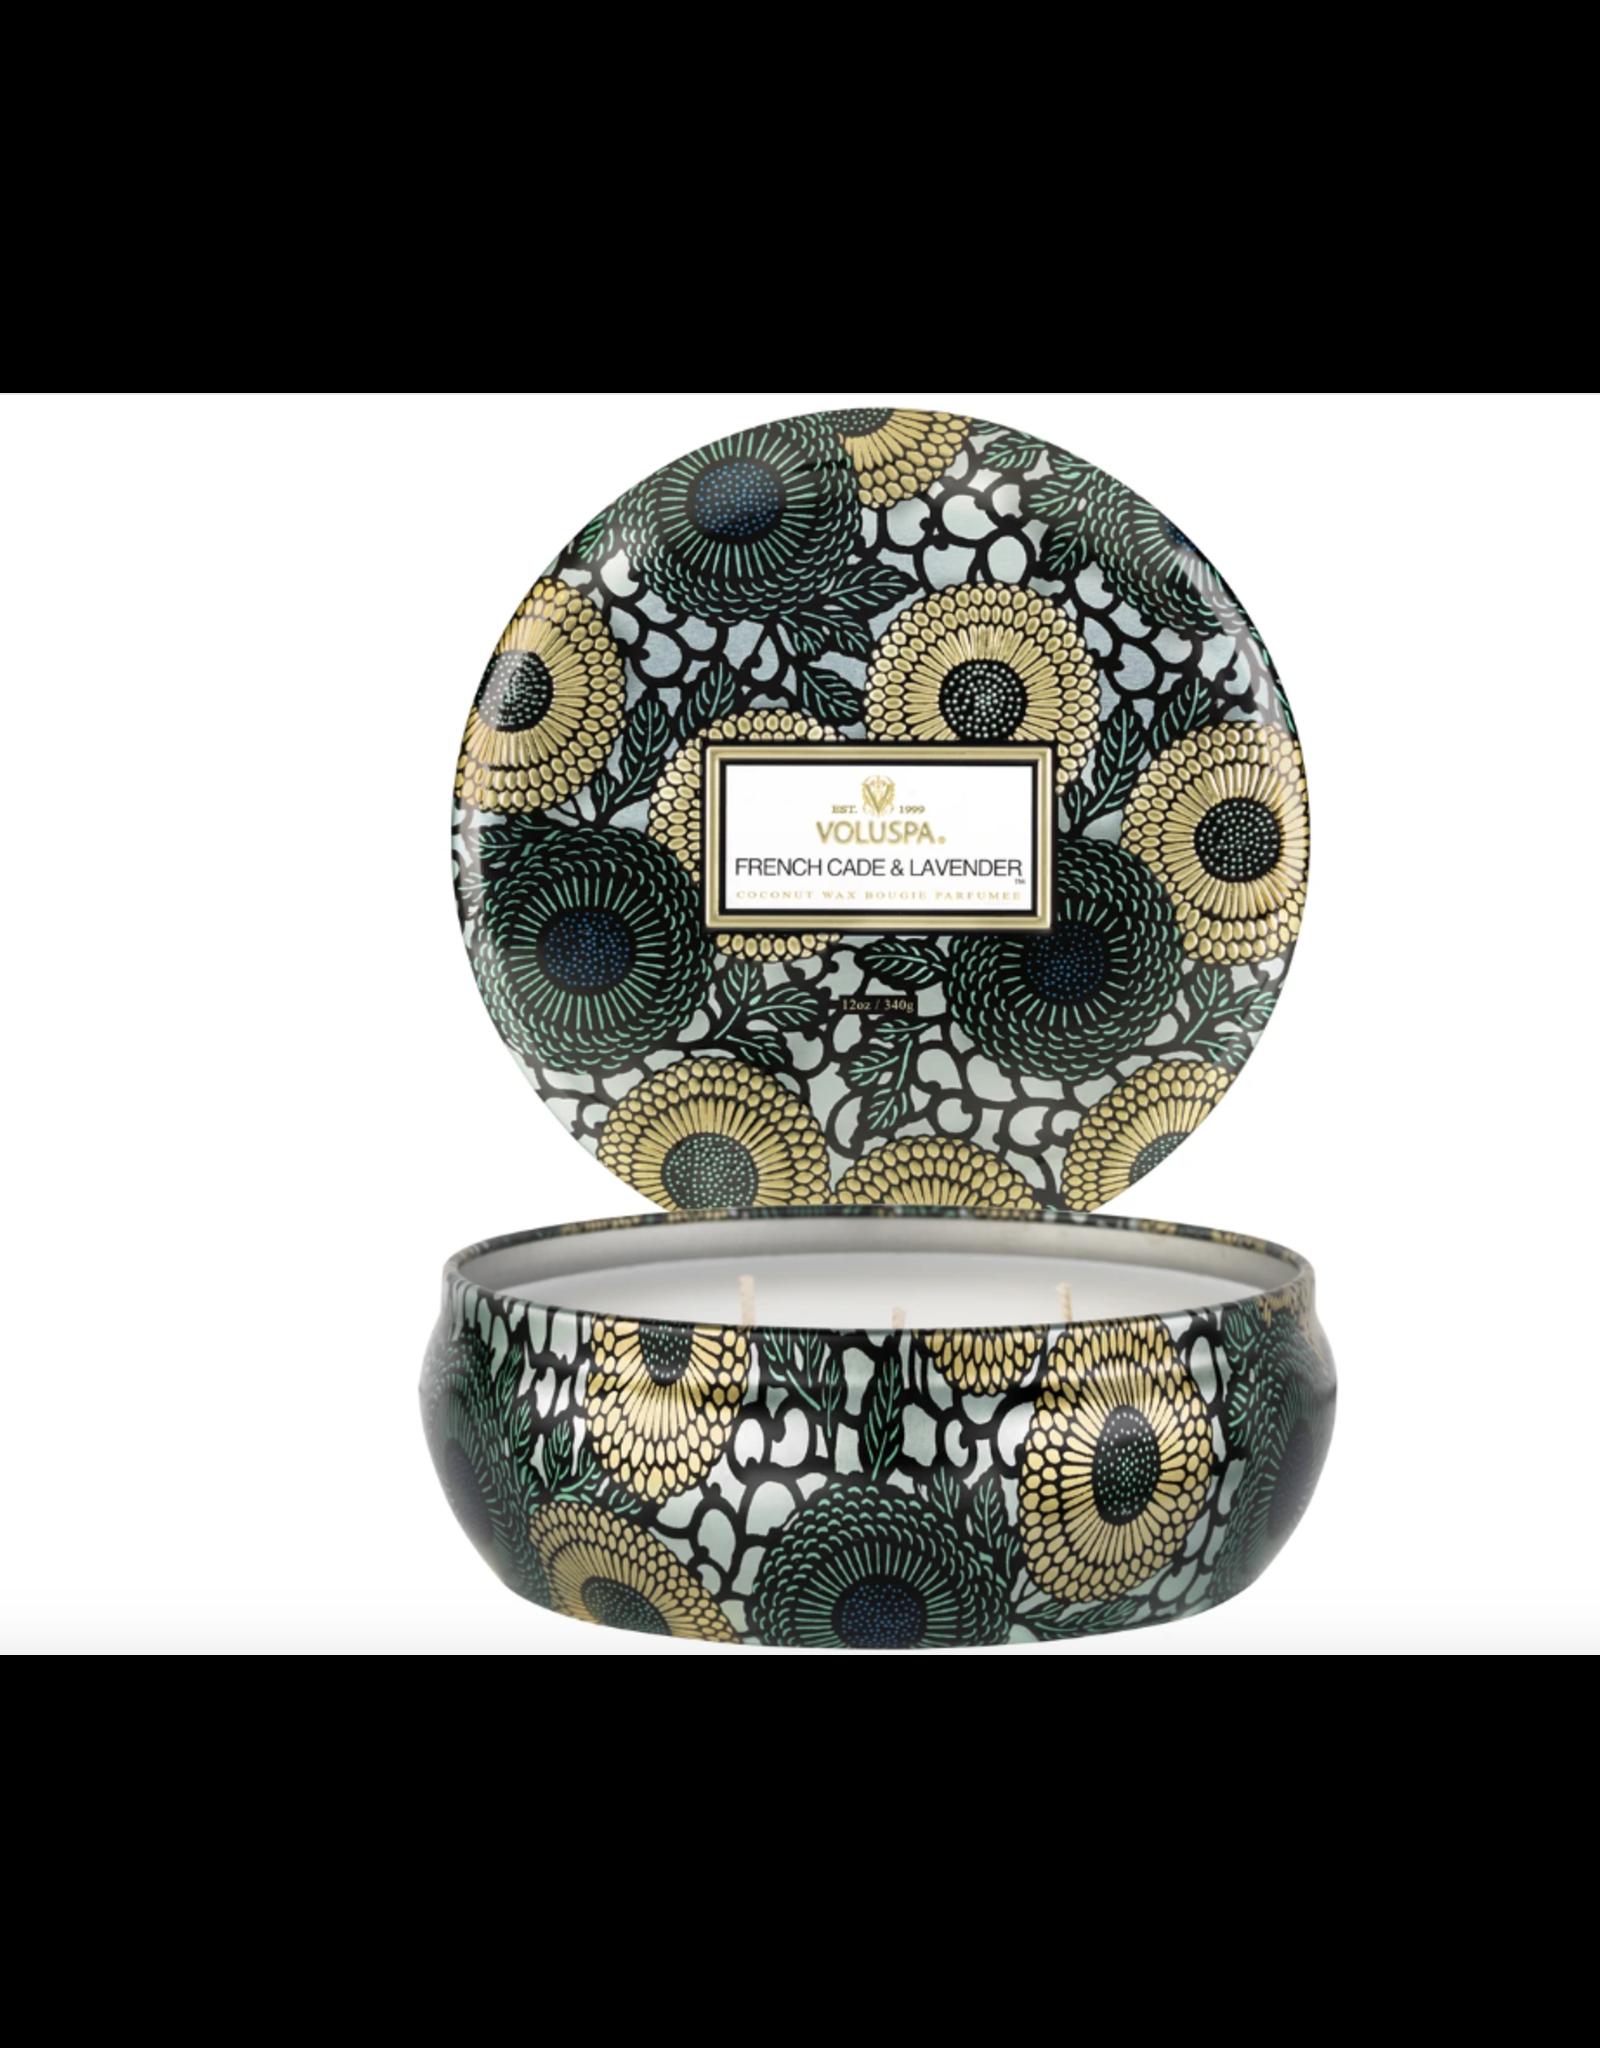 Voluspa French Cade & Lavender 3 Wick Candle in Decorative Tin